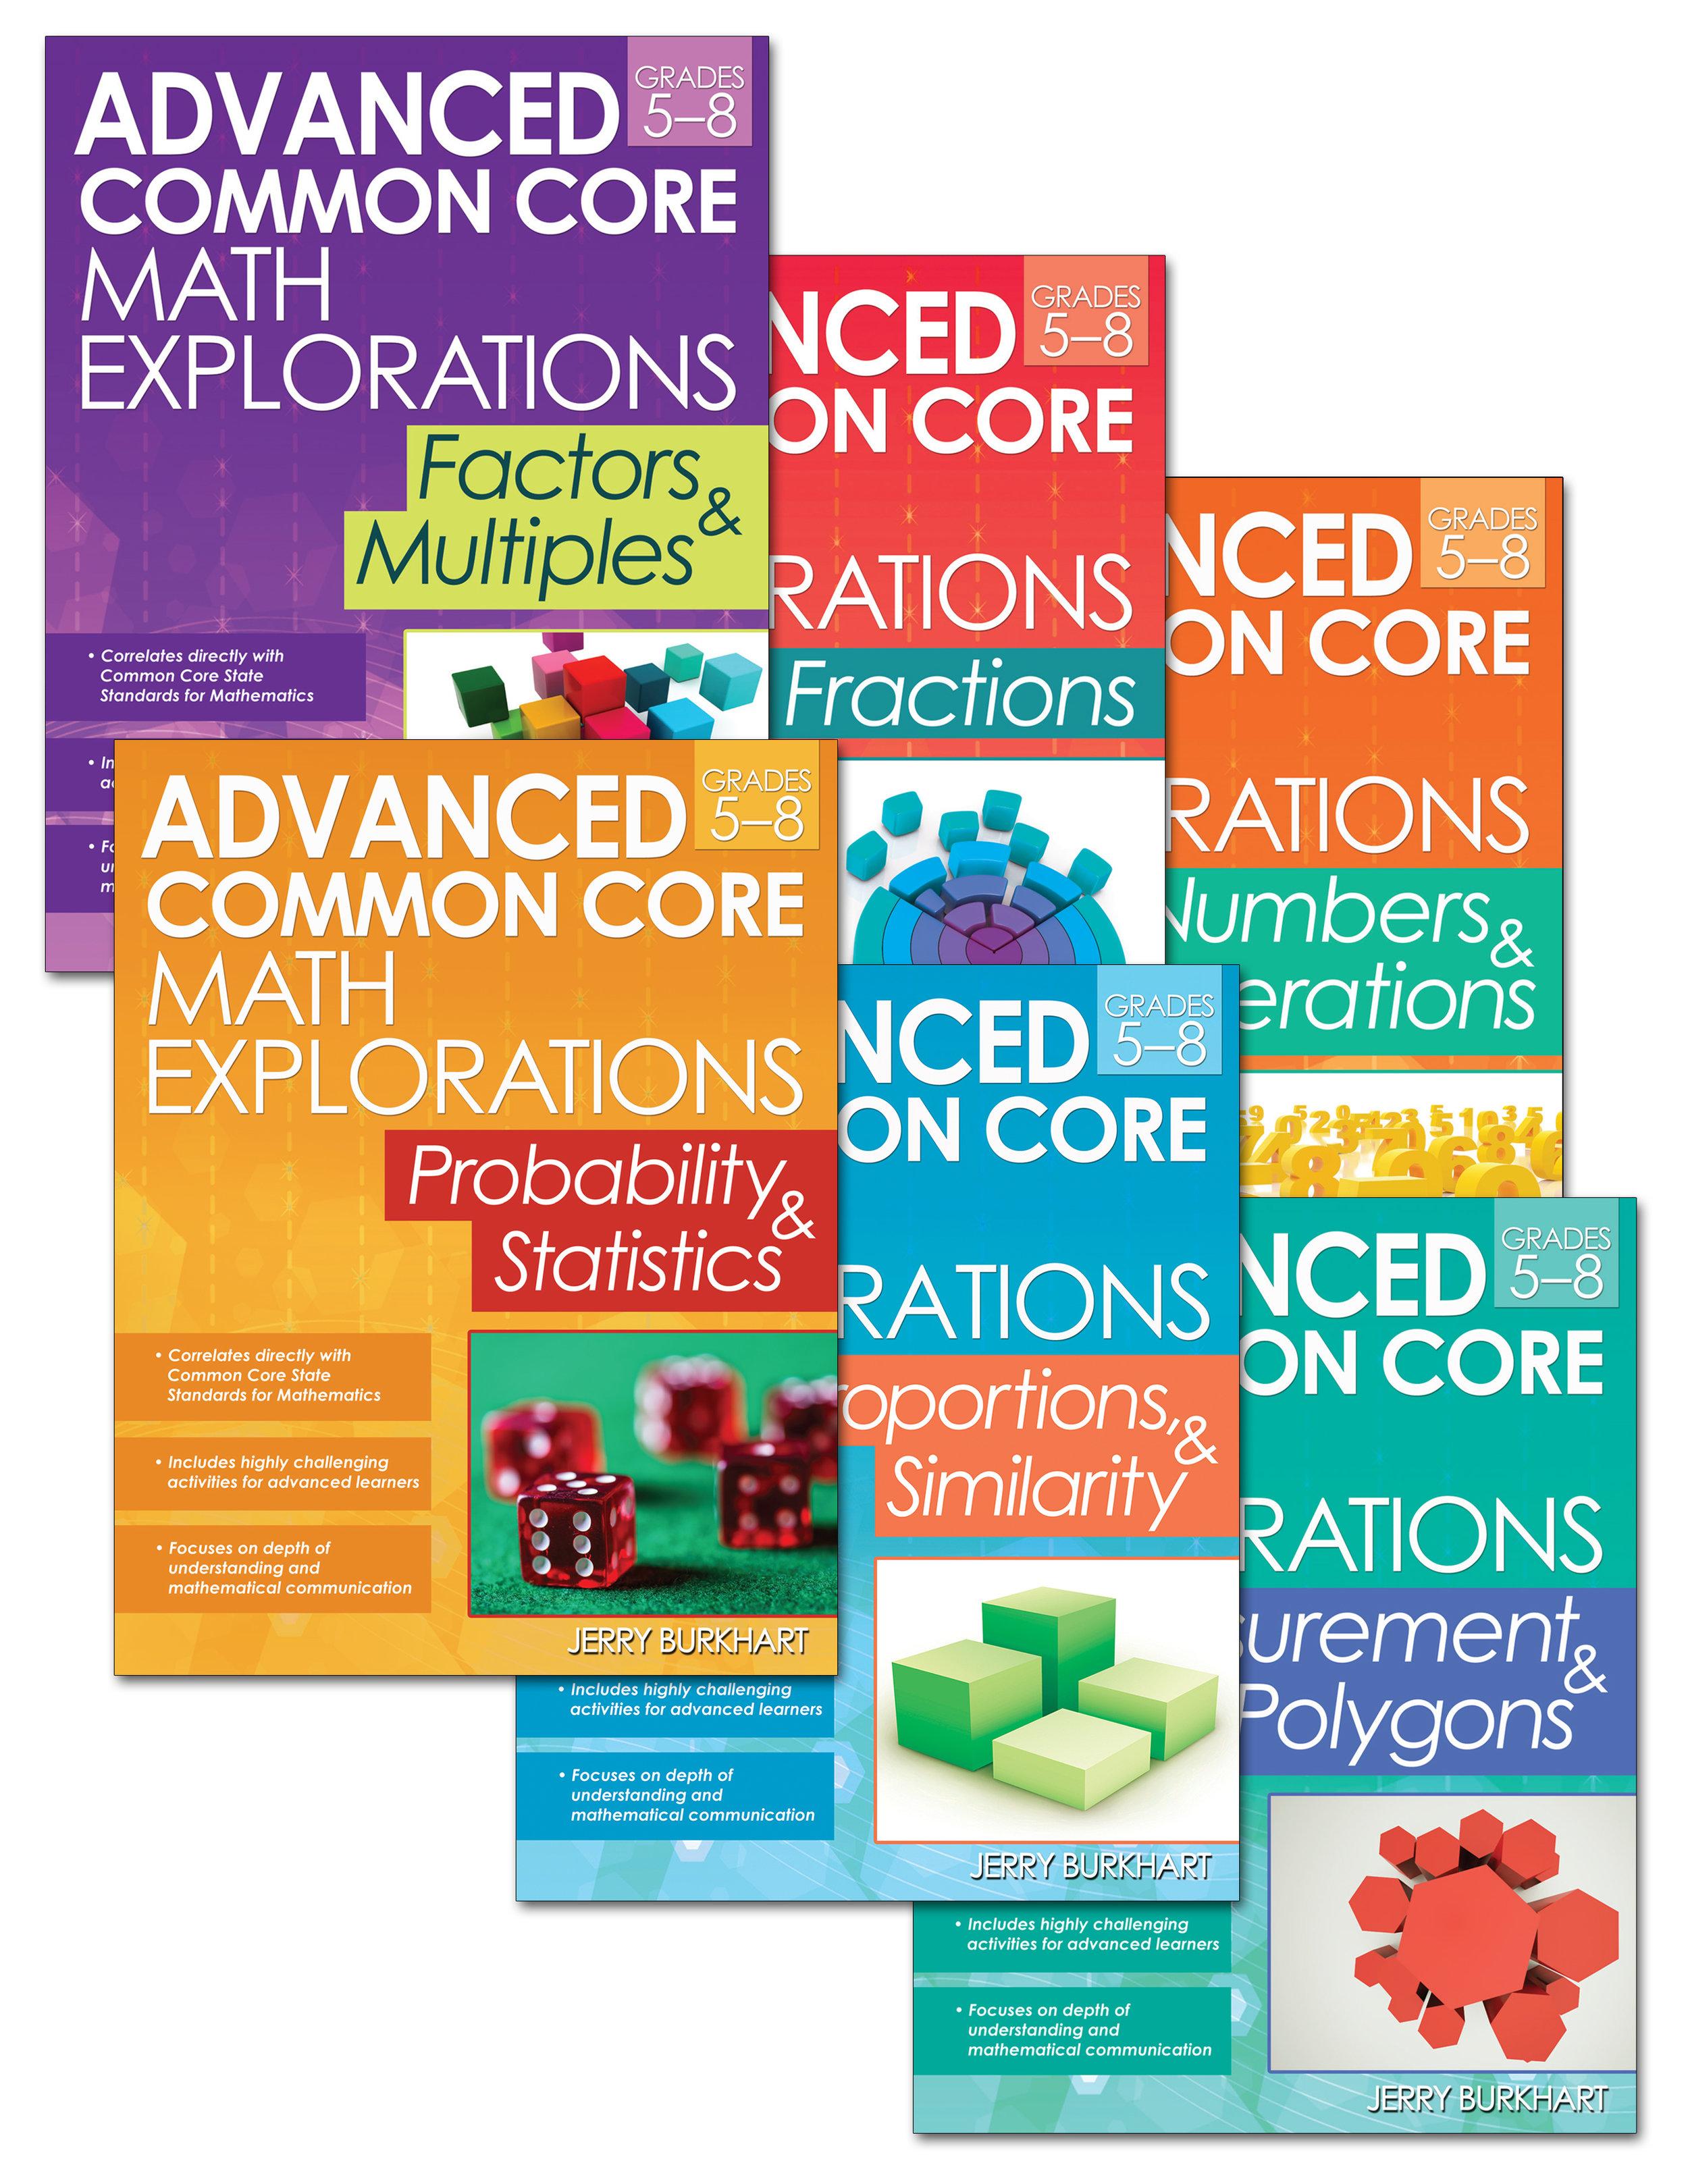 Advanced CC Math Explorations Covers.jpg